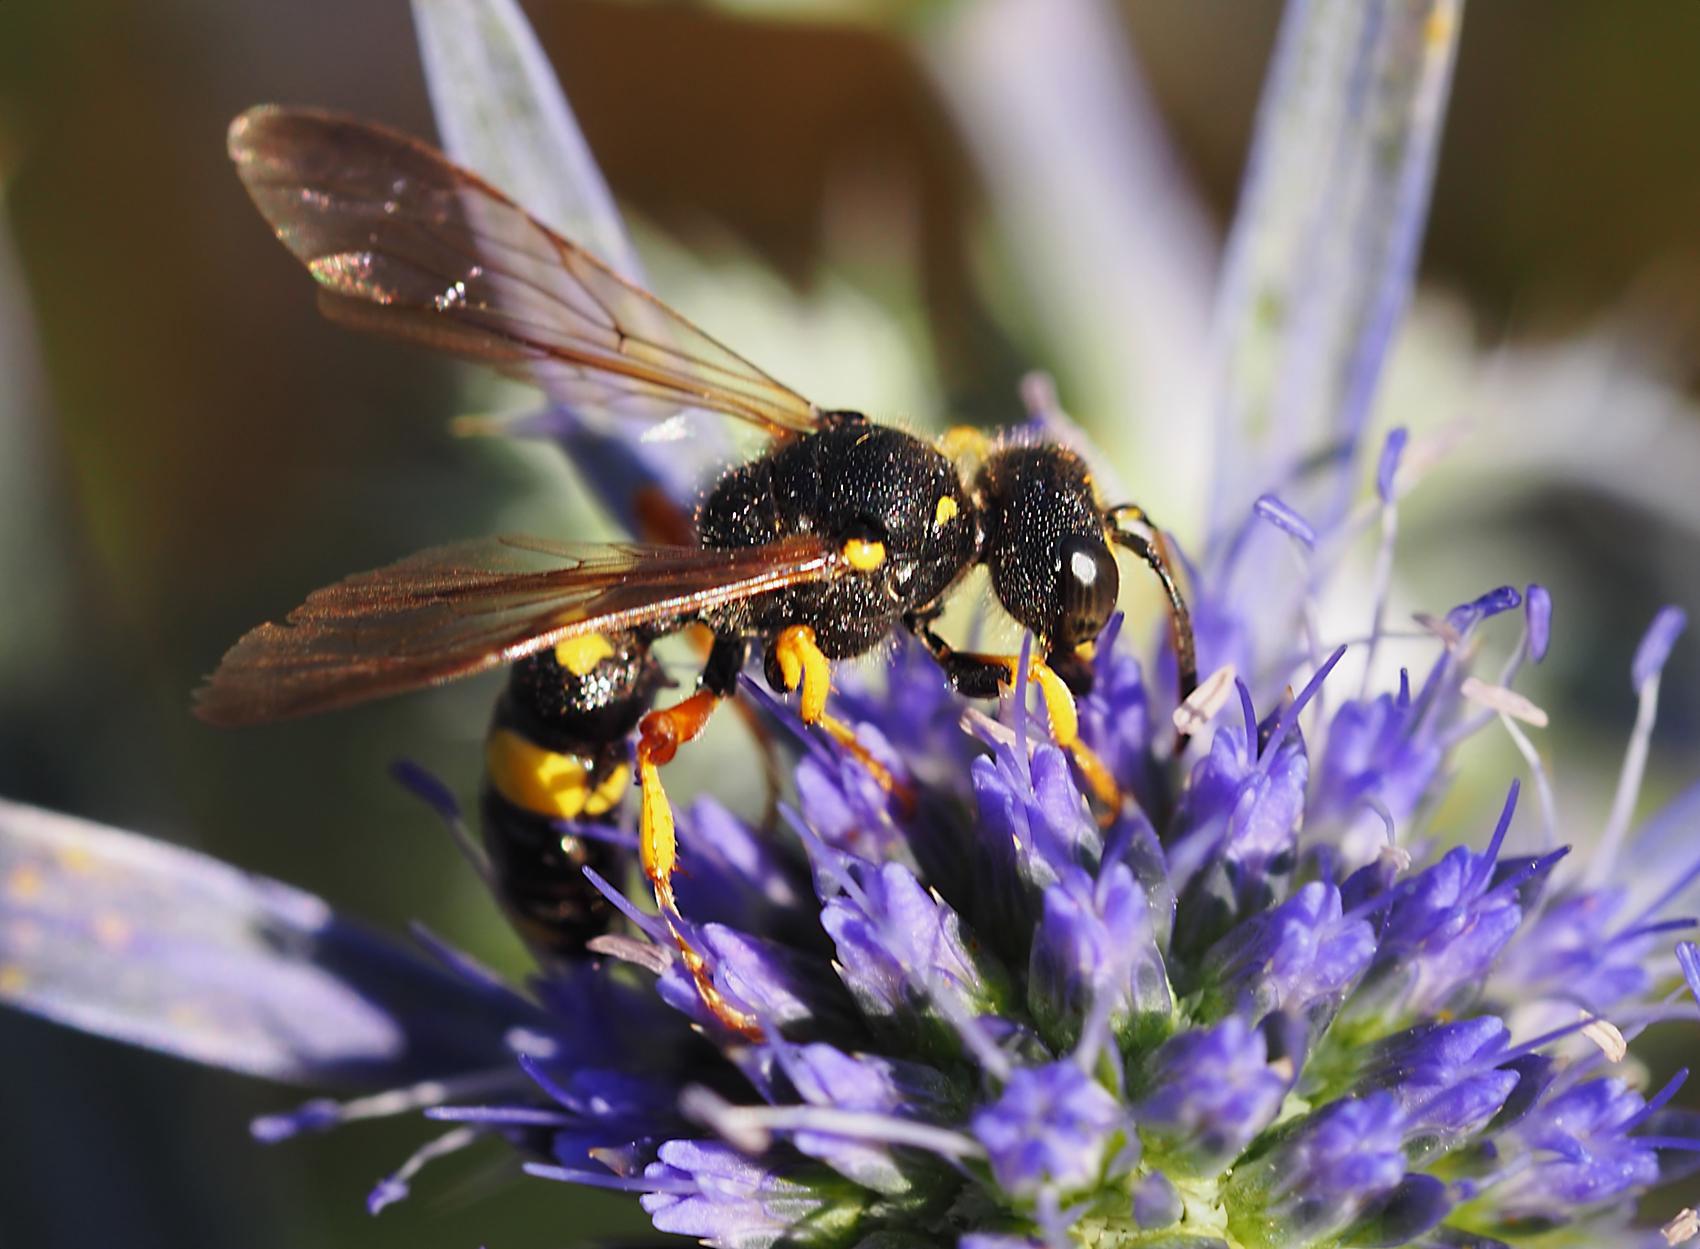 Bienenjagende Knotenwespe05 (Cerceris rybyensis)